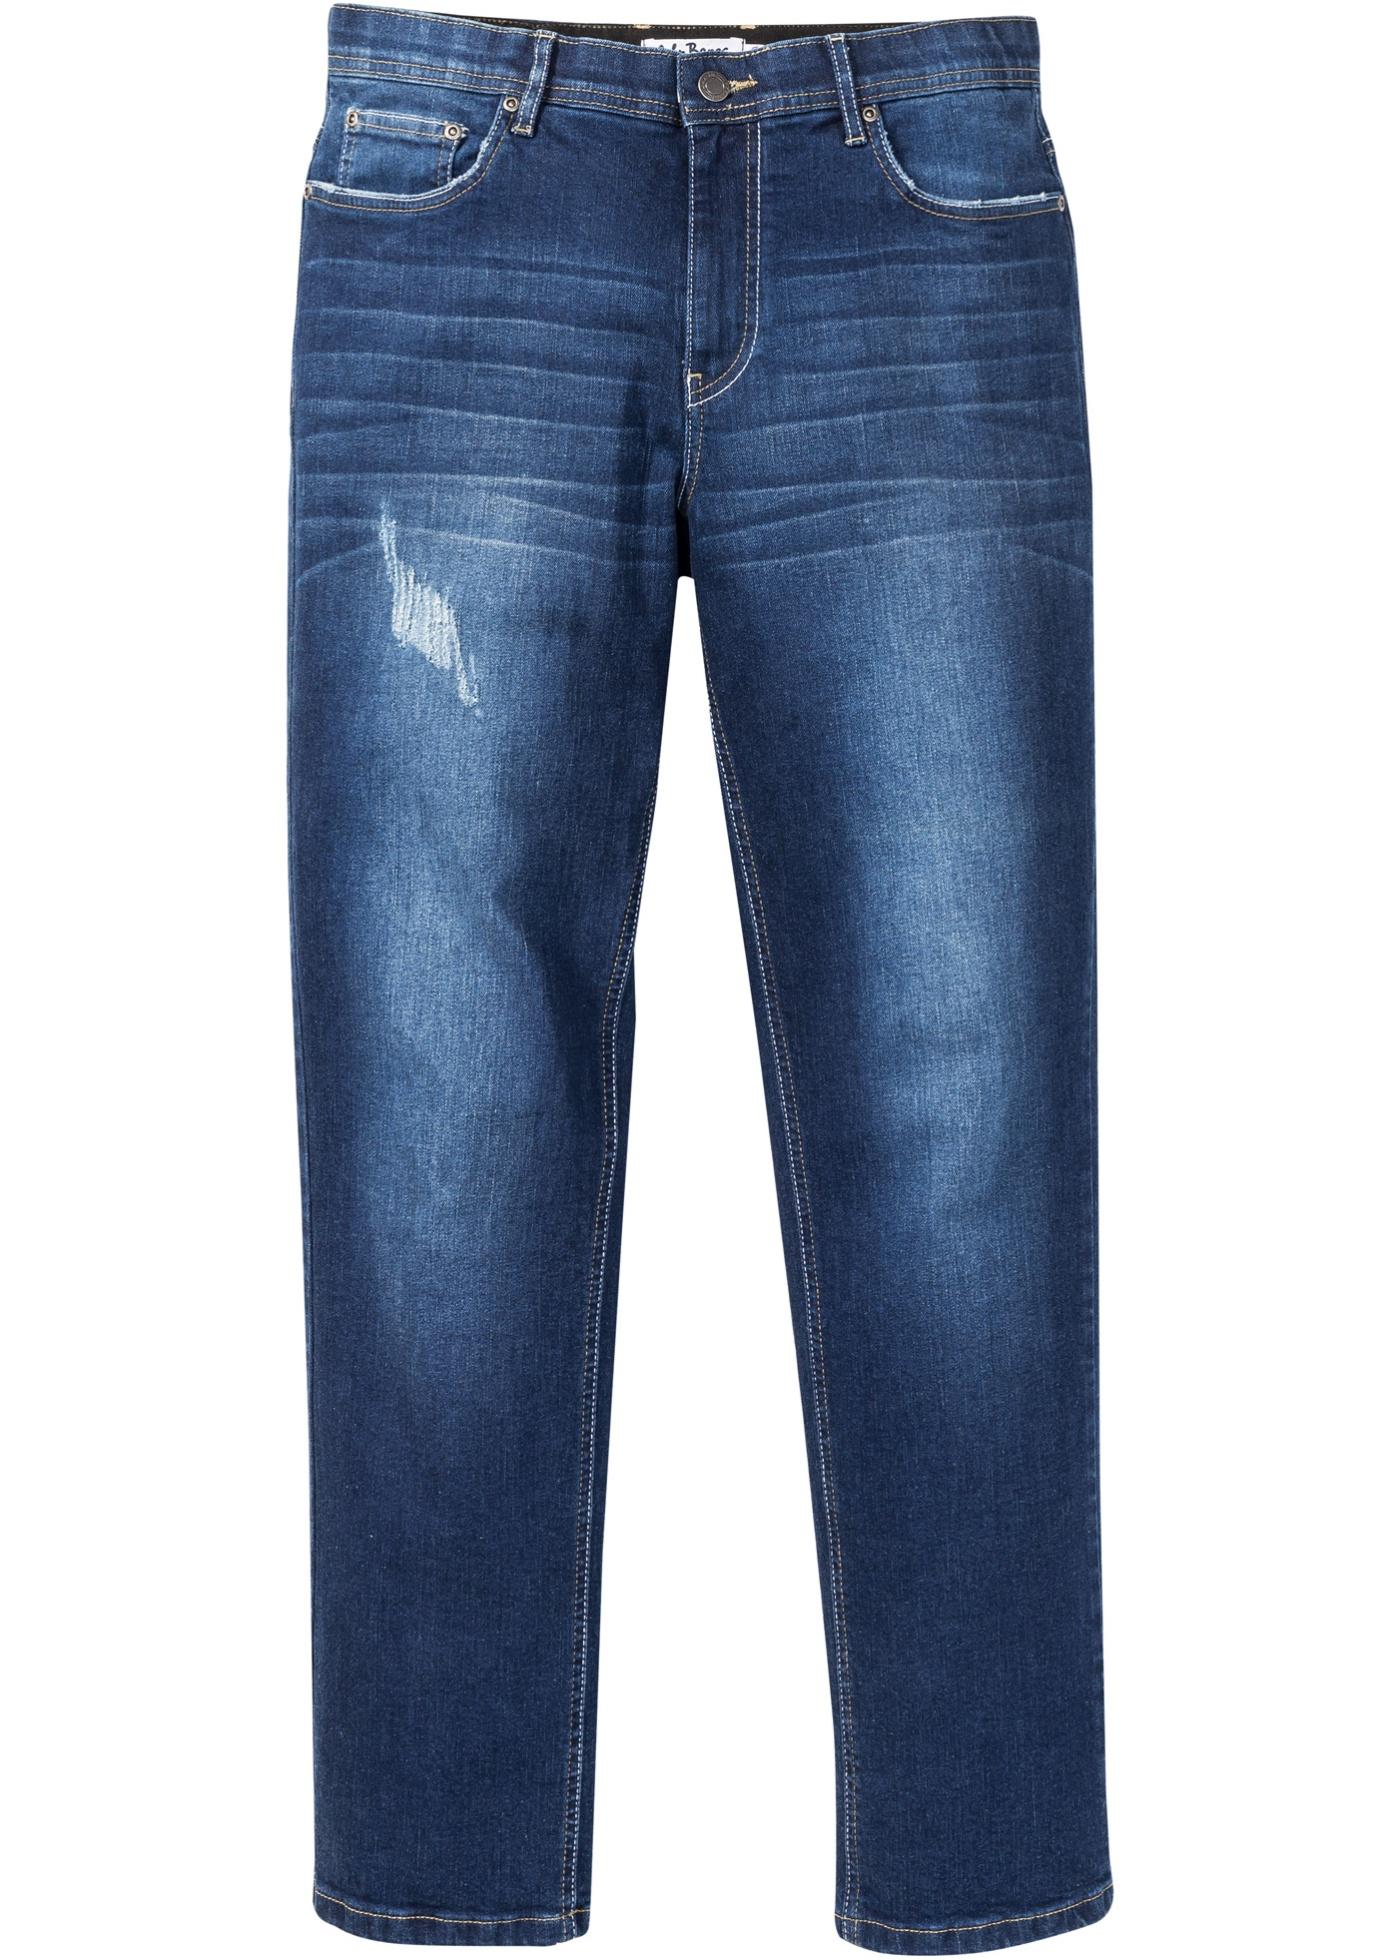 Jeans confortevole regula